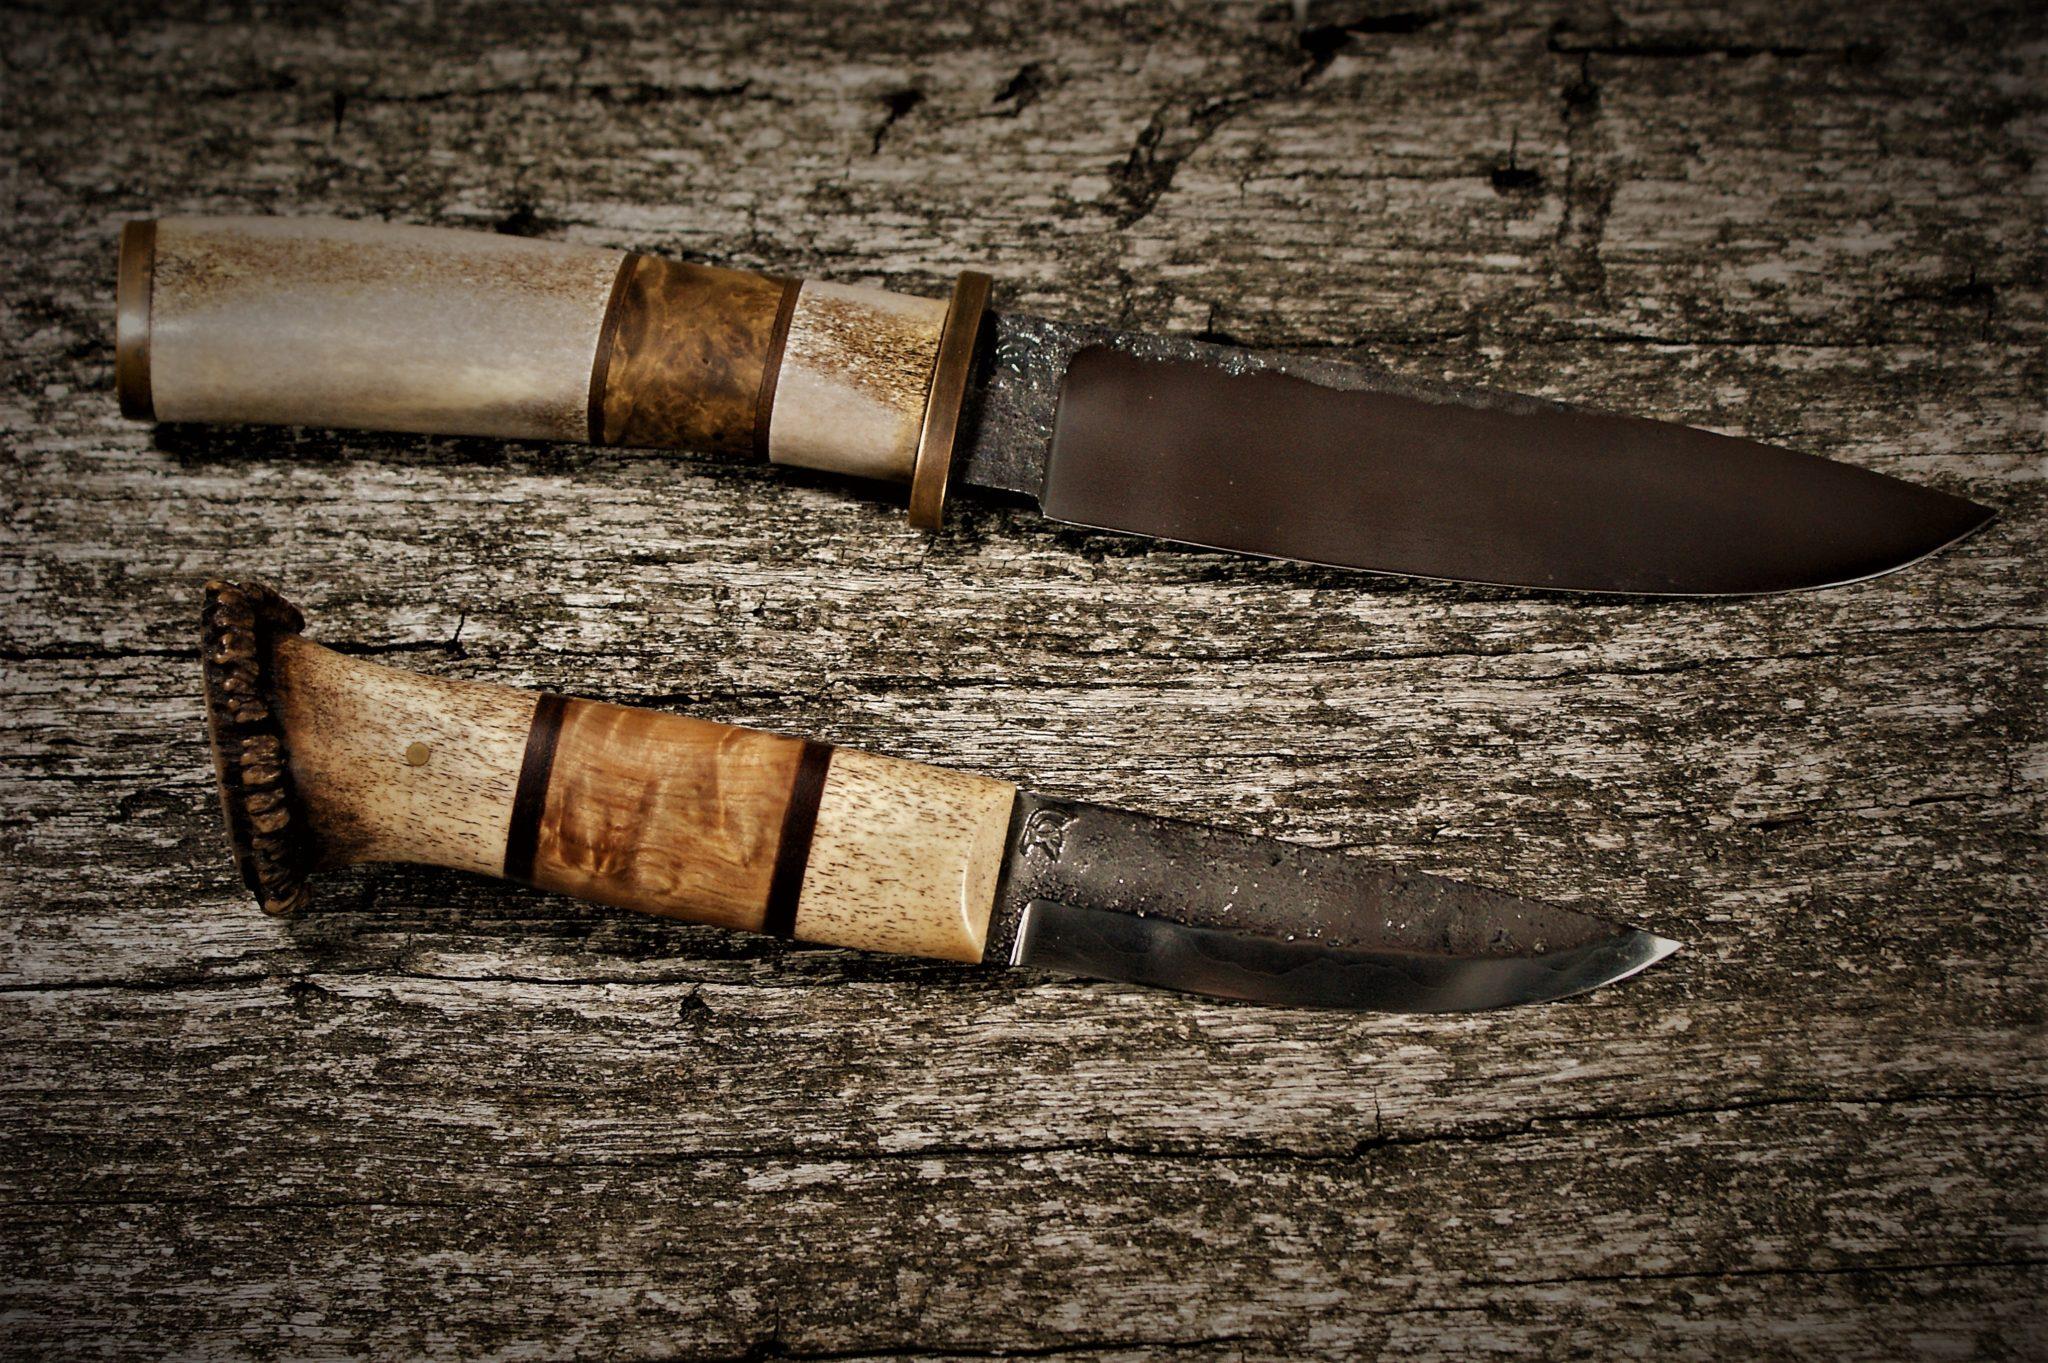 Dvorak Sharp Knives